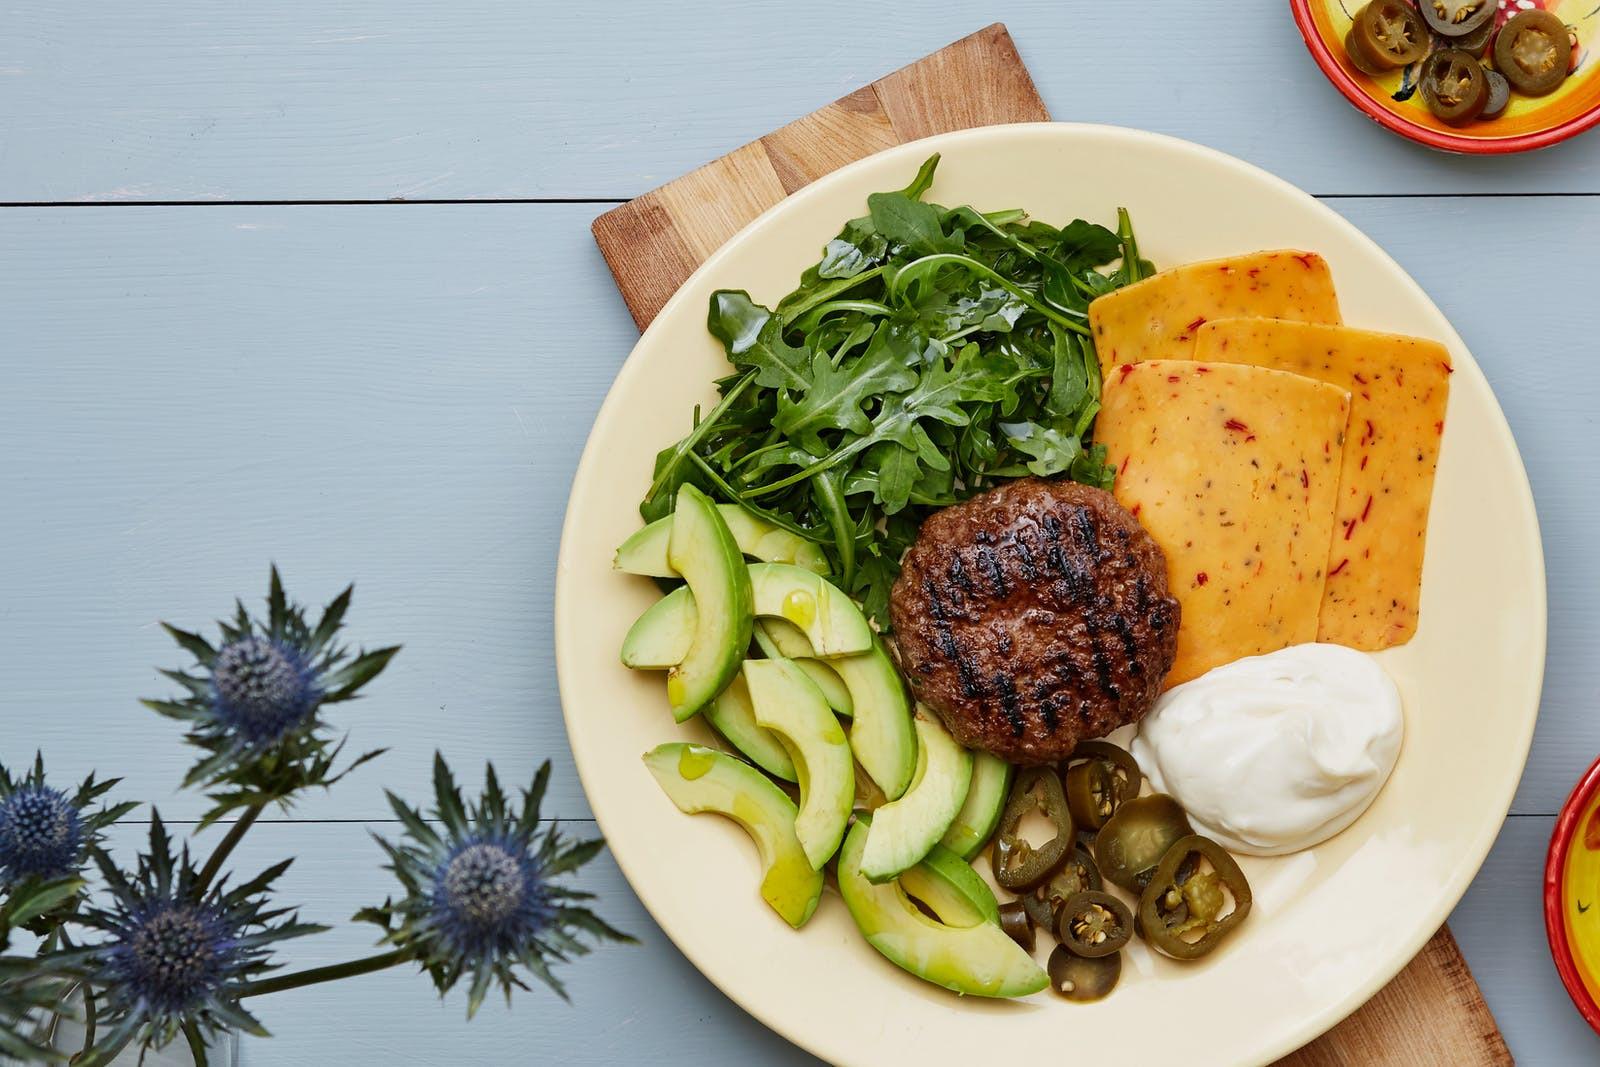 Hamburger Keto Recipes Low Carb  Low Carb and Keto Hamburger Recipes – Diet Doctor